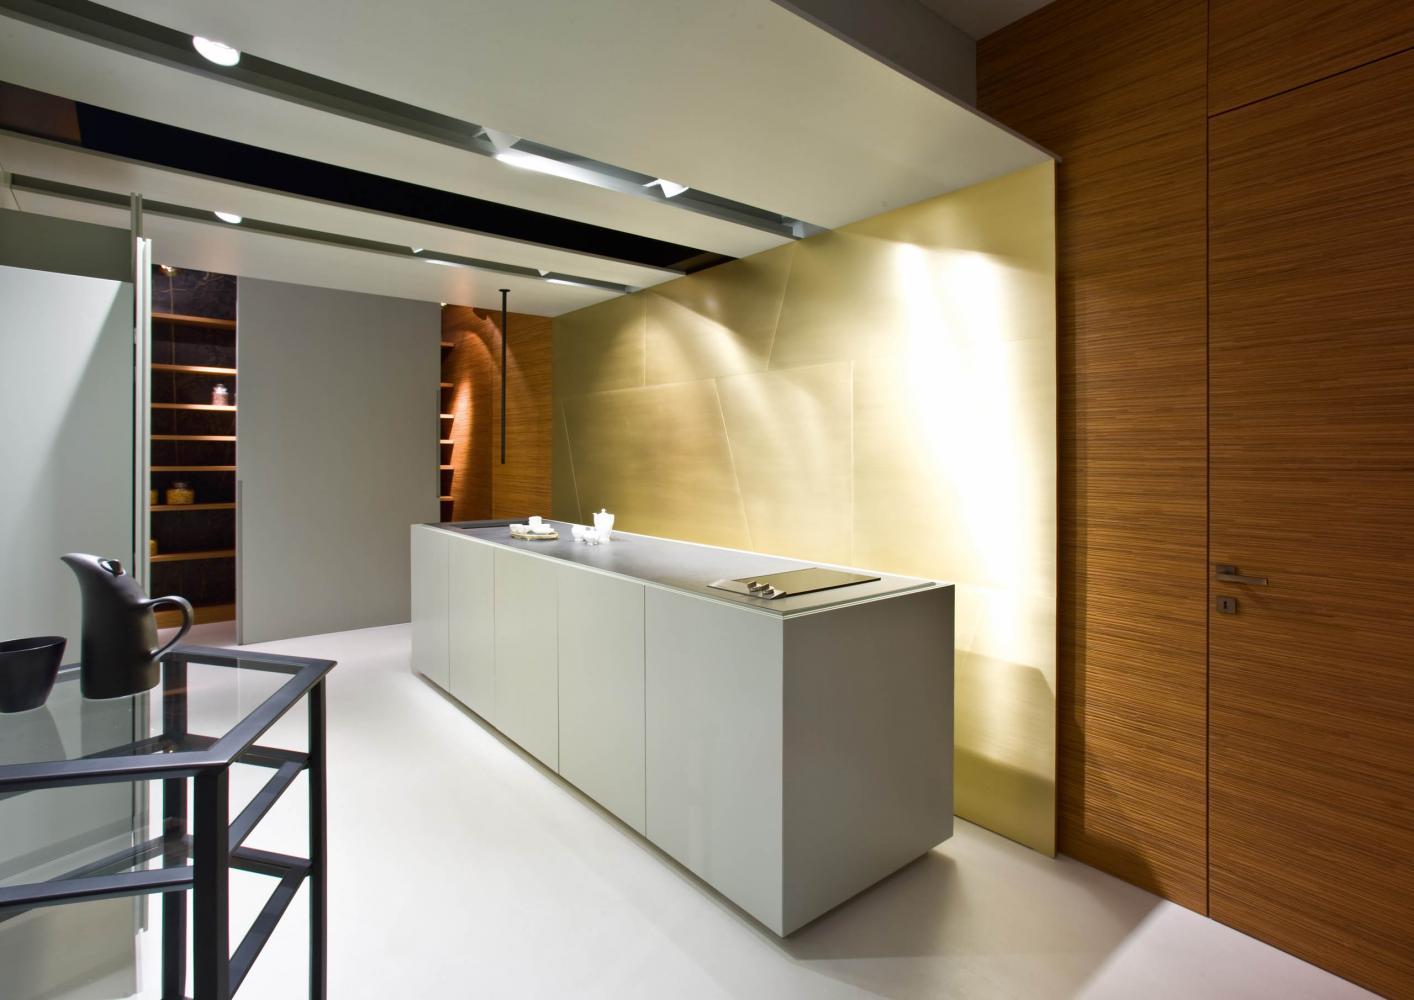 kitchen displayed at laurameroni factory showroom in alzate brianza como italy